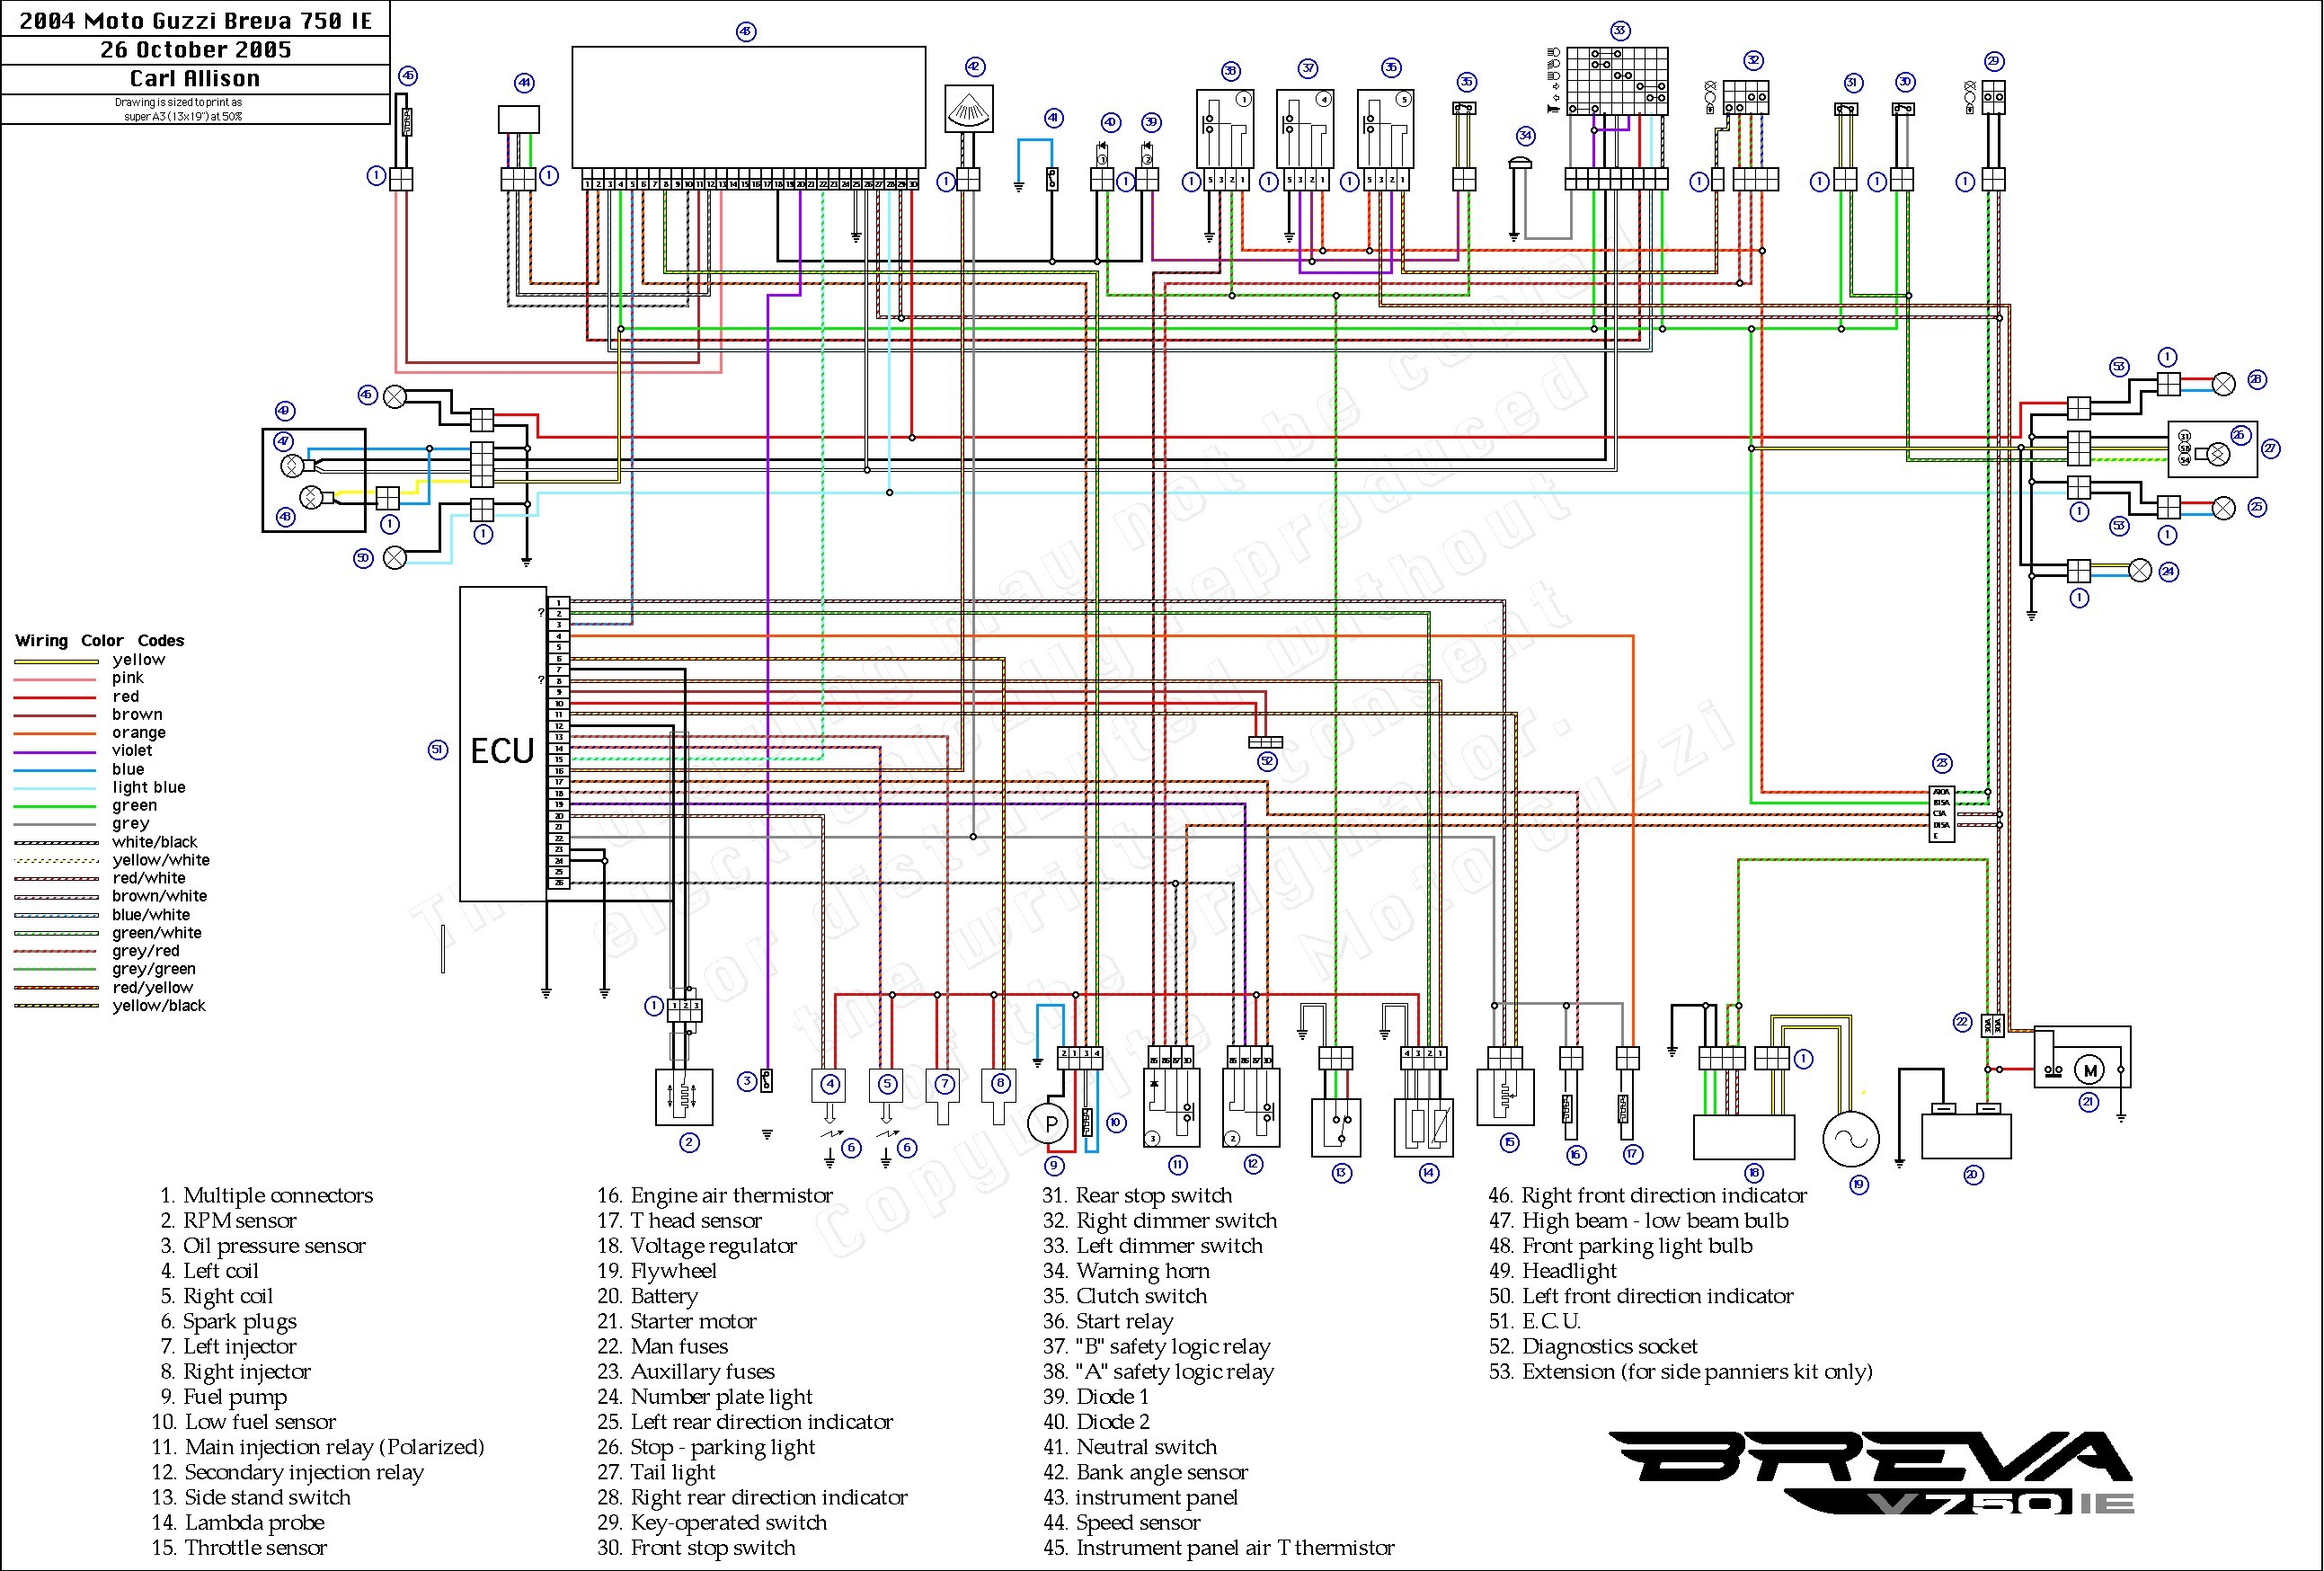 Dodge Ram 1500 Engine Diagram Cummins Diesel Fuel Line Obd2 Wiring 2004 Copy